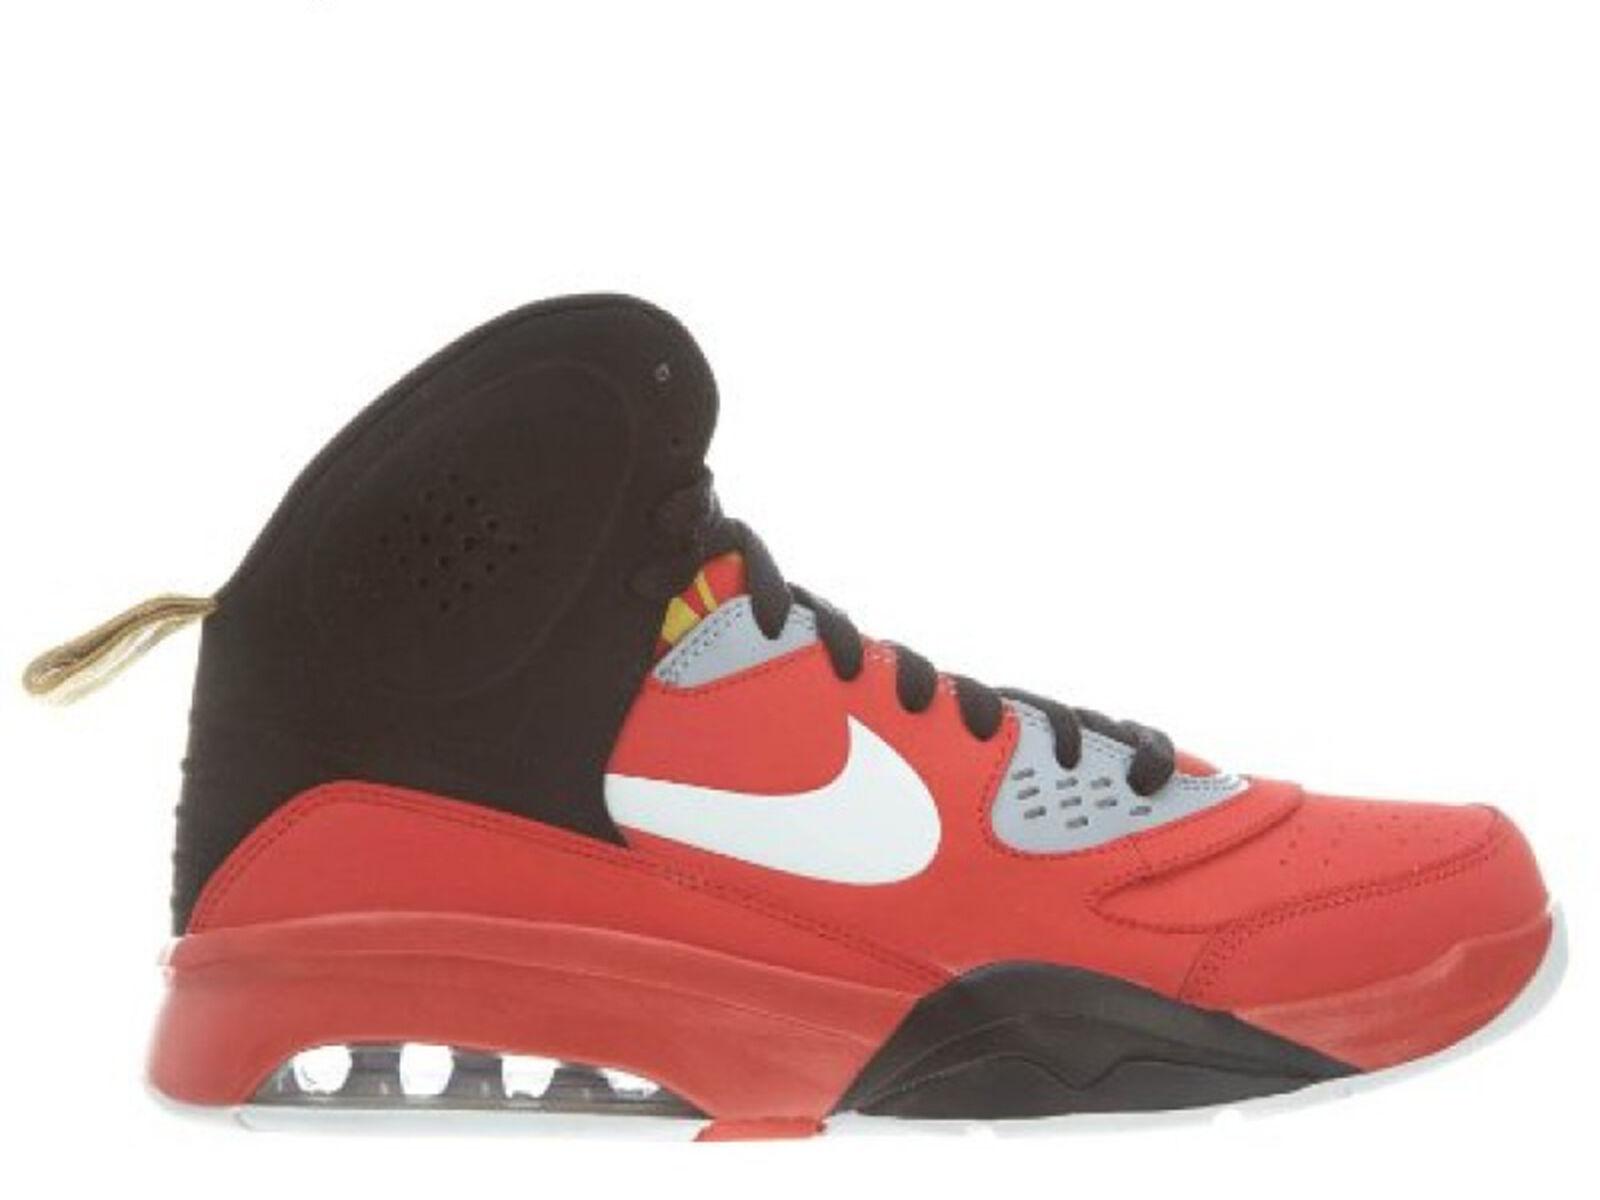 Herren Brandneu Nike Luft Ultimate Force Athletic Mode Turnschuhe